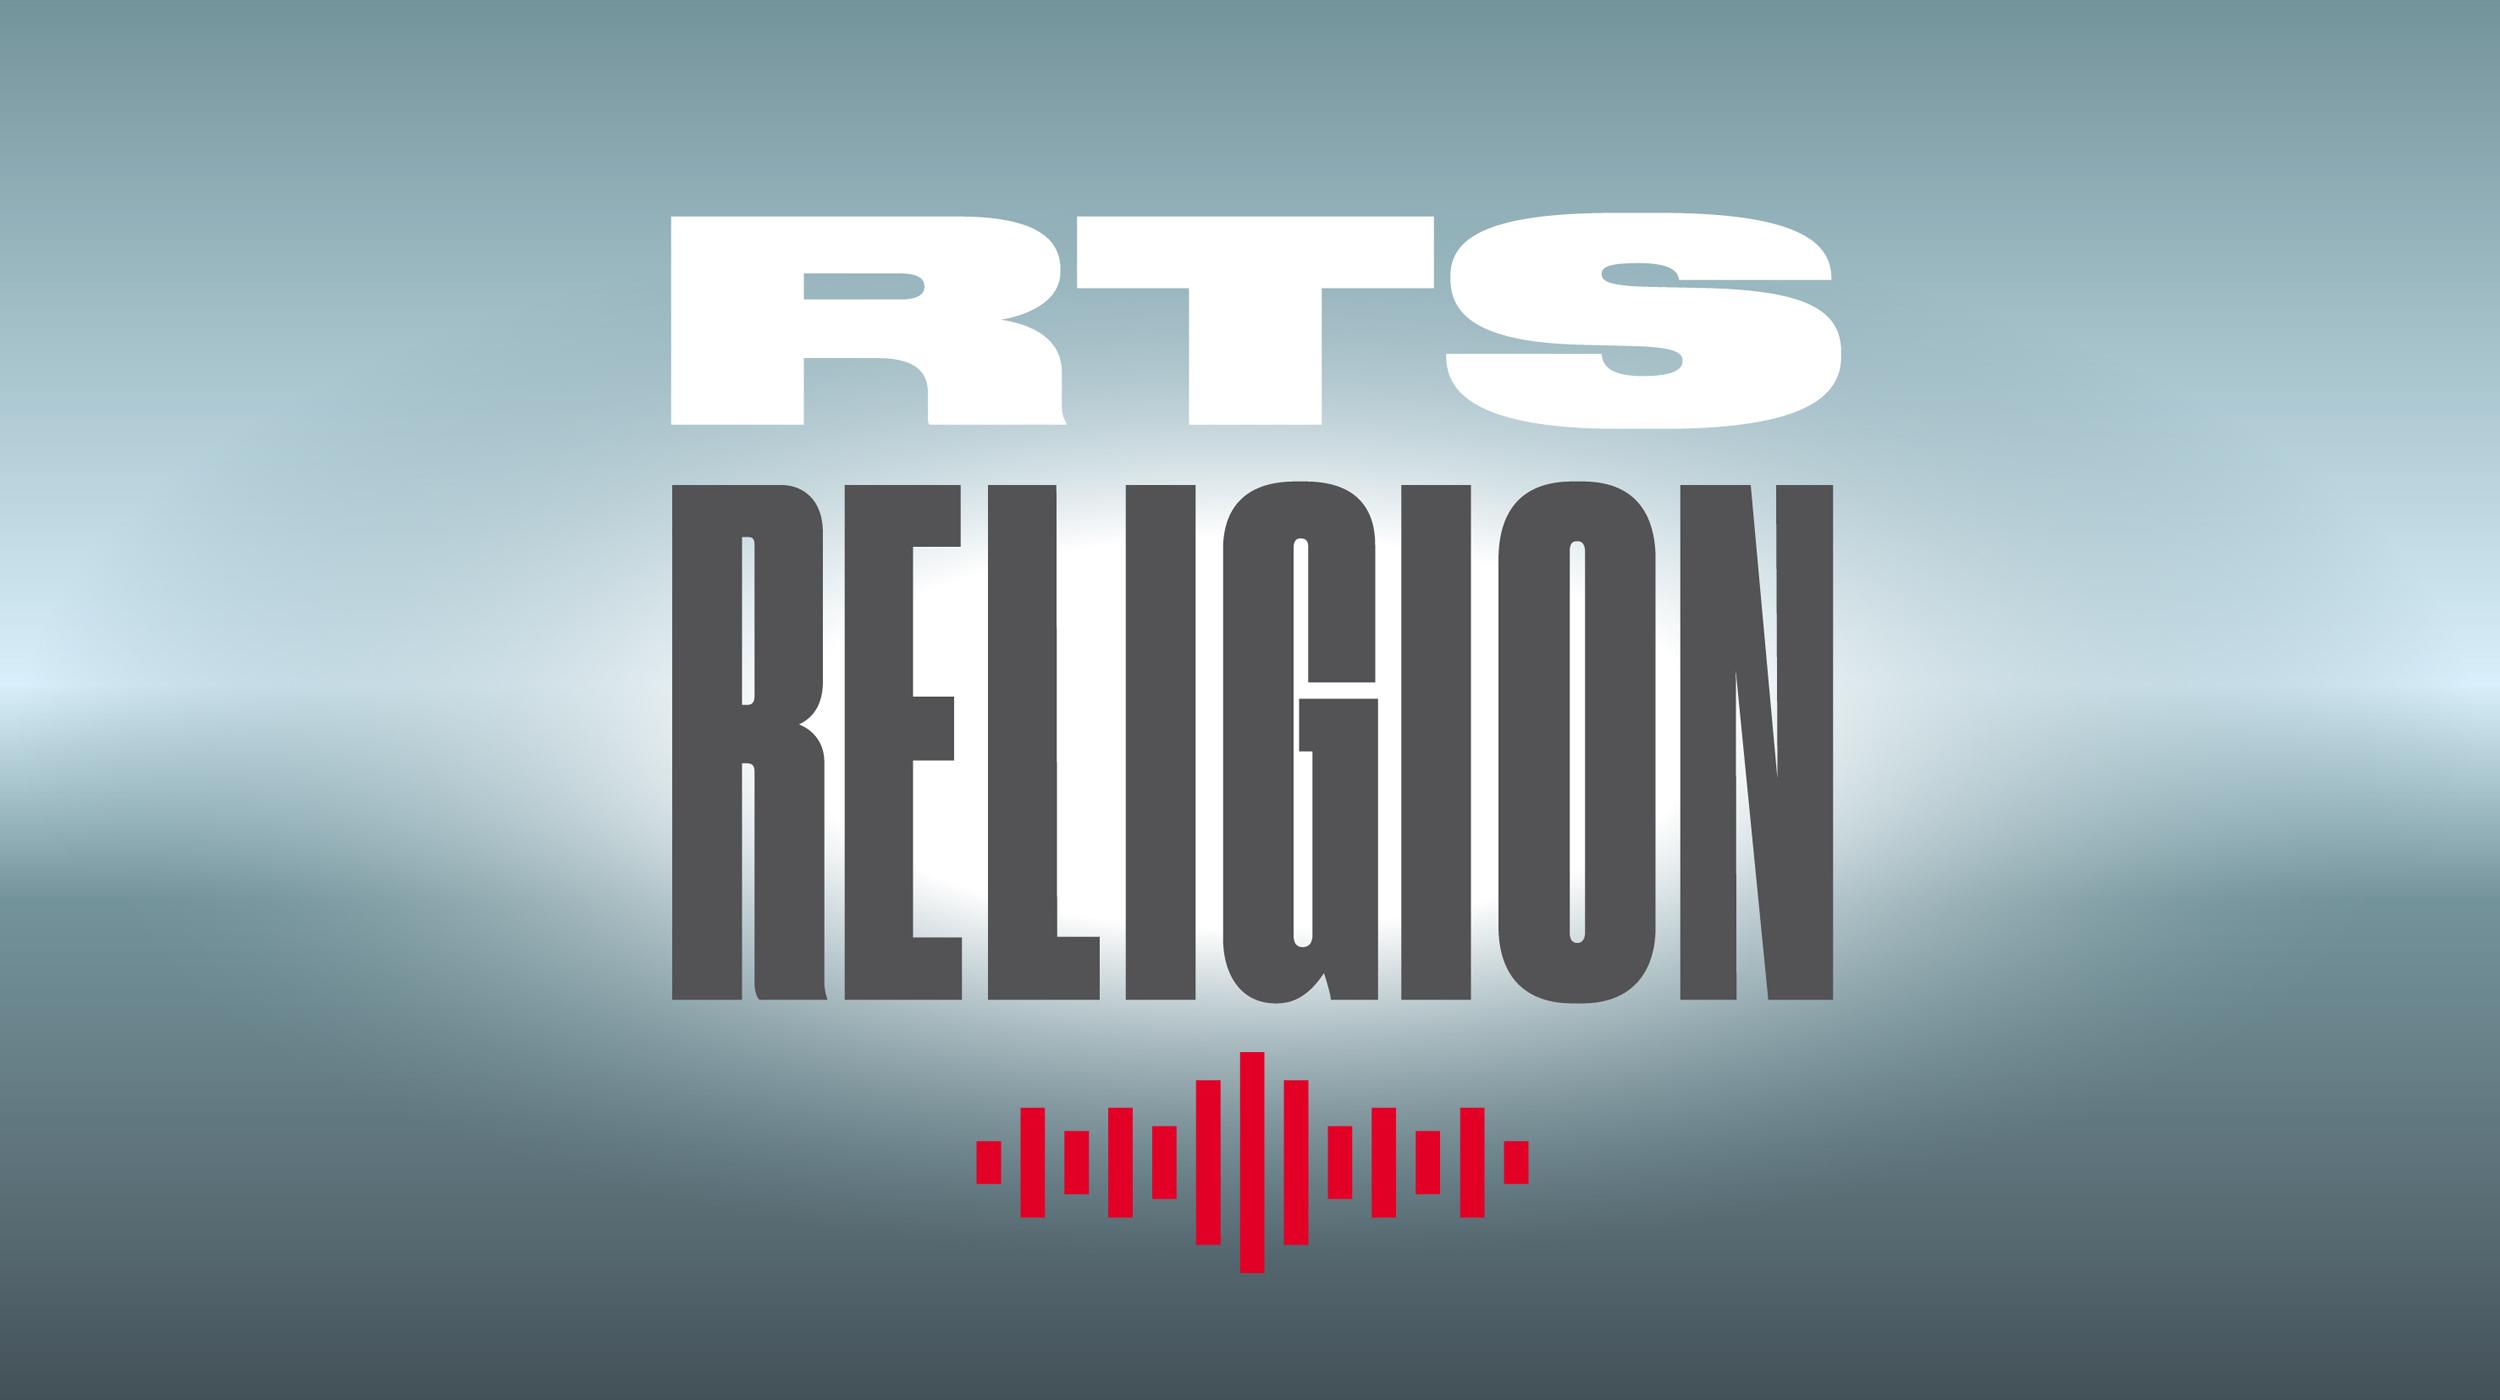 RTSreligion.